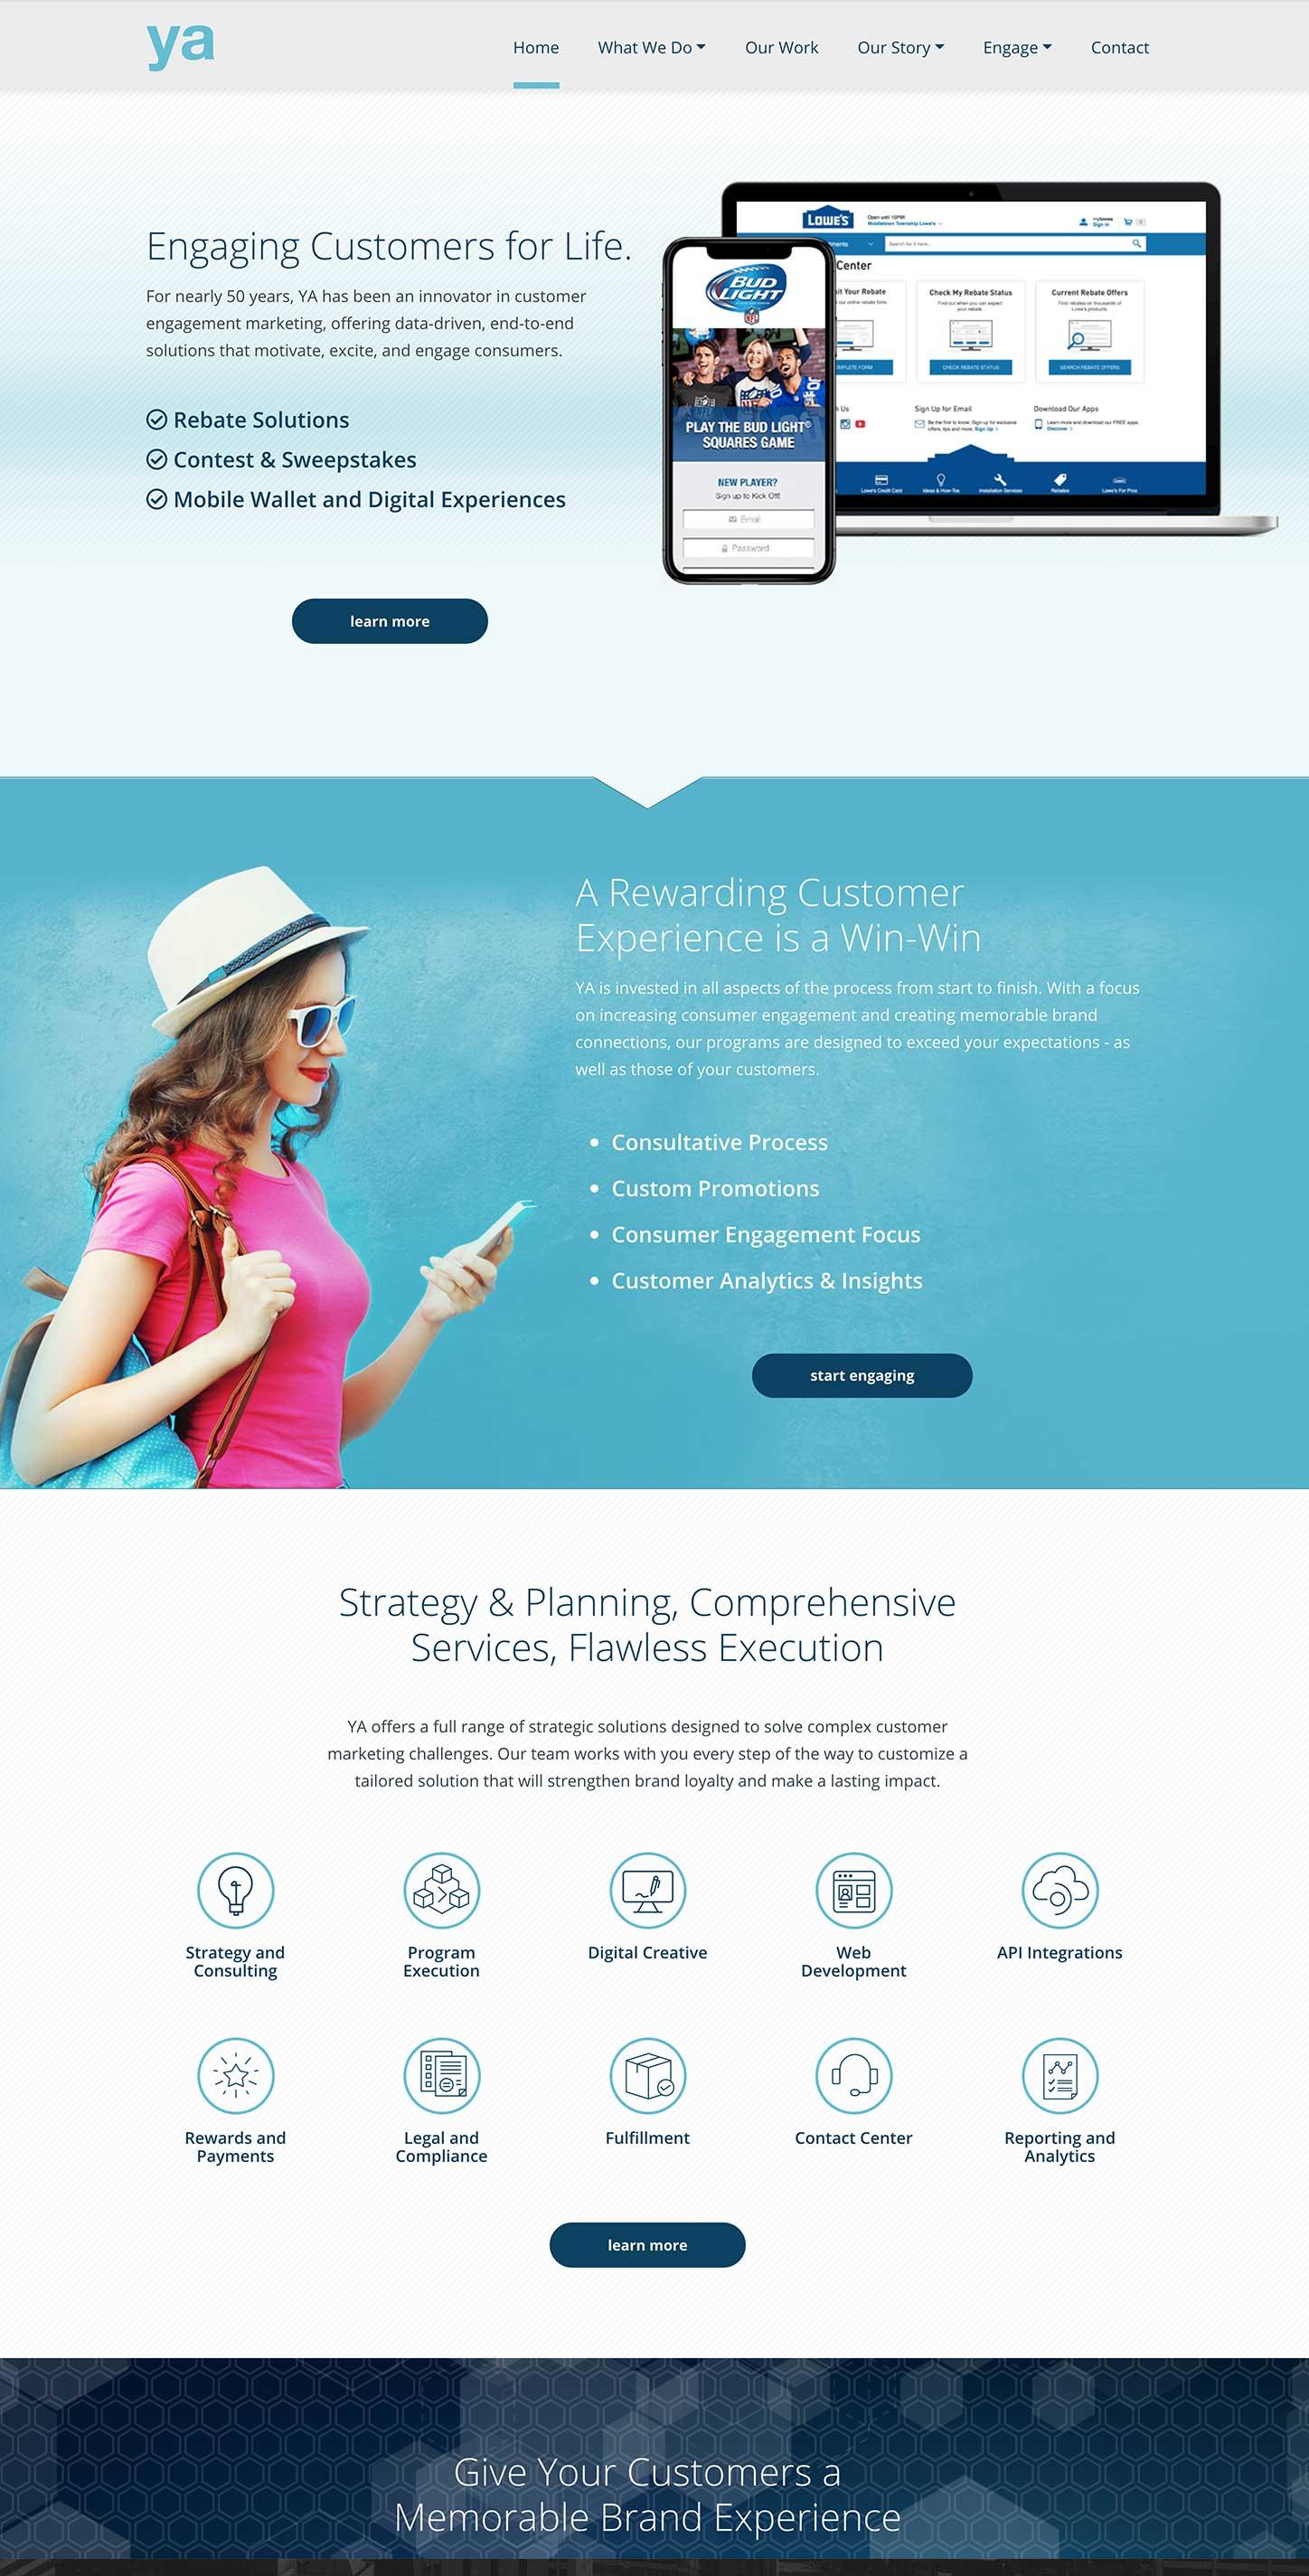 YA Engage website design